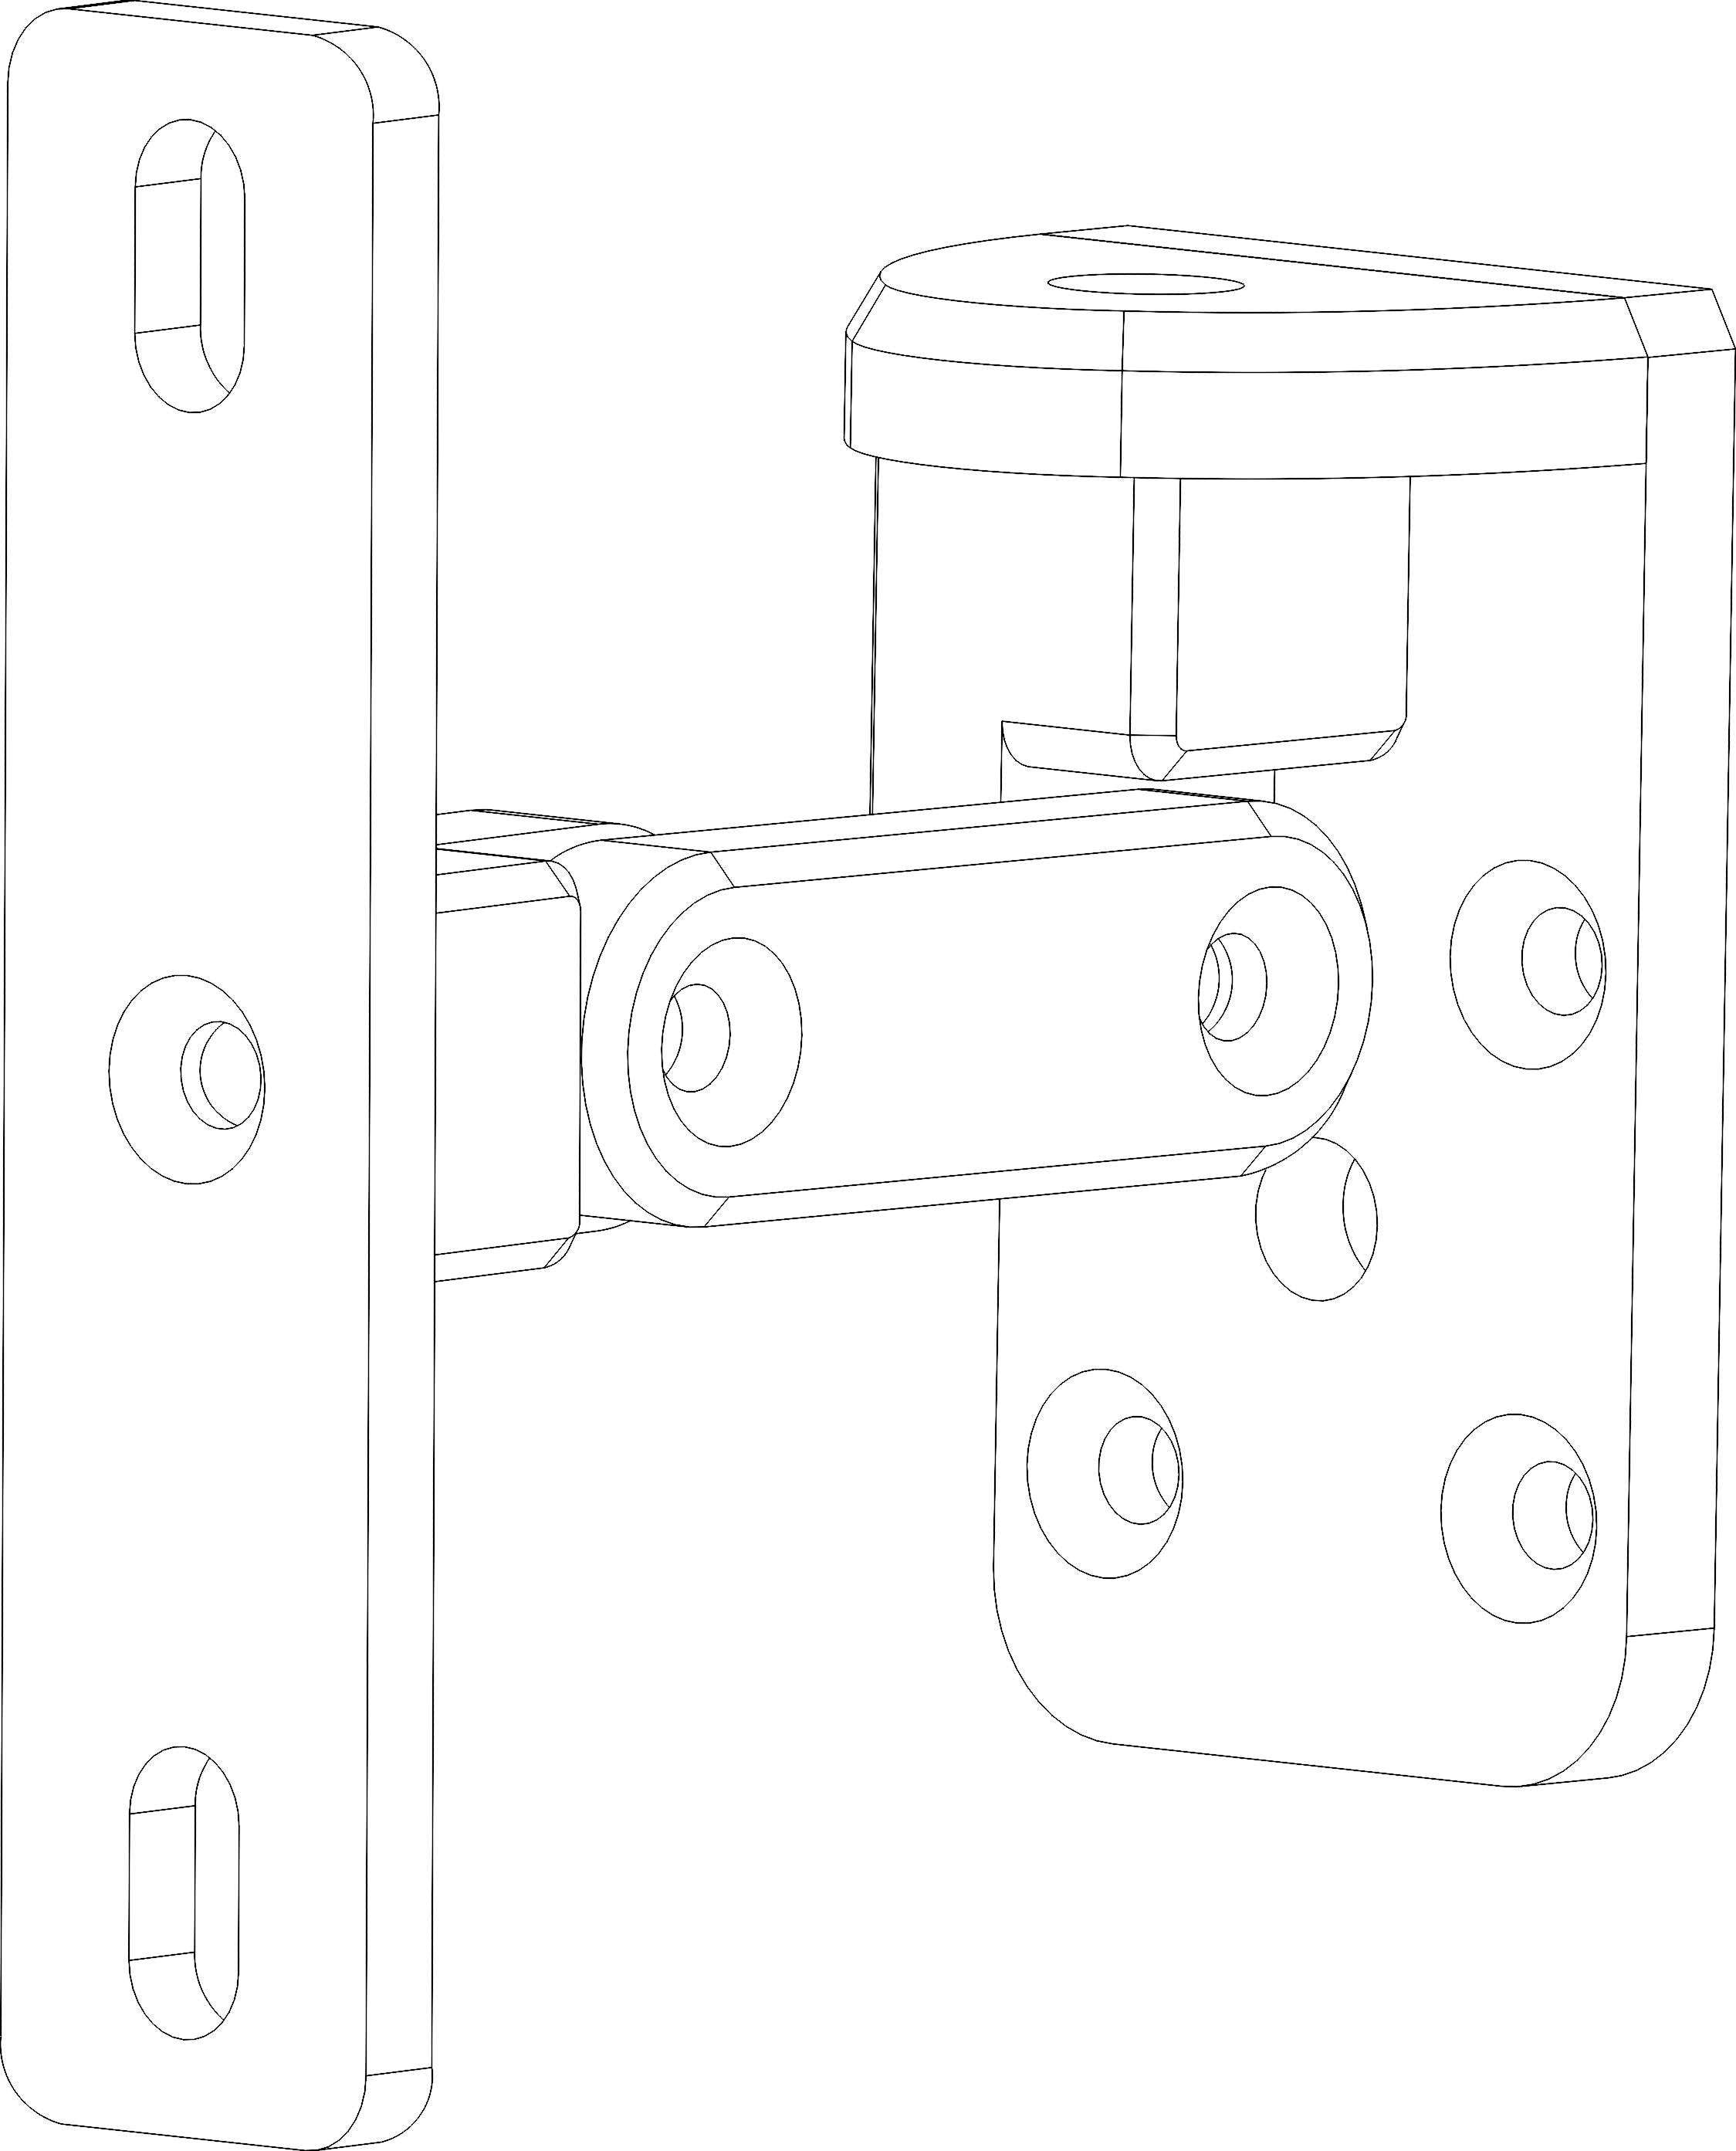 CI-001B吊架